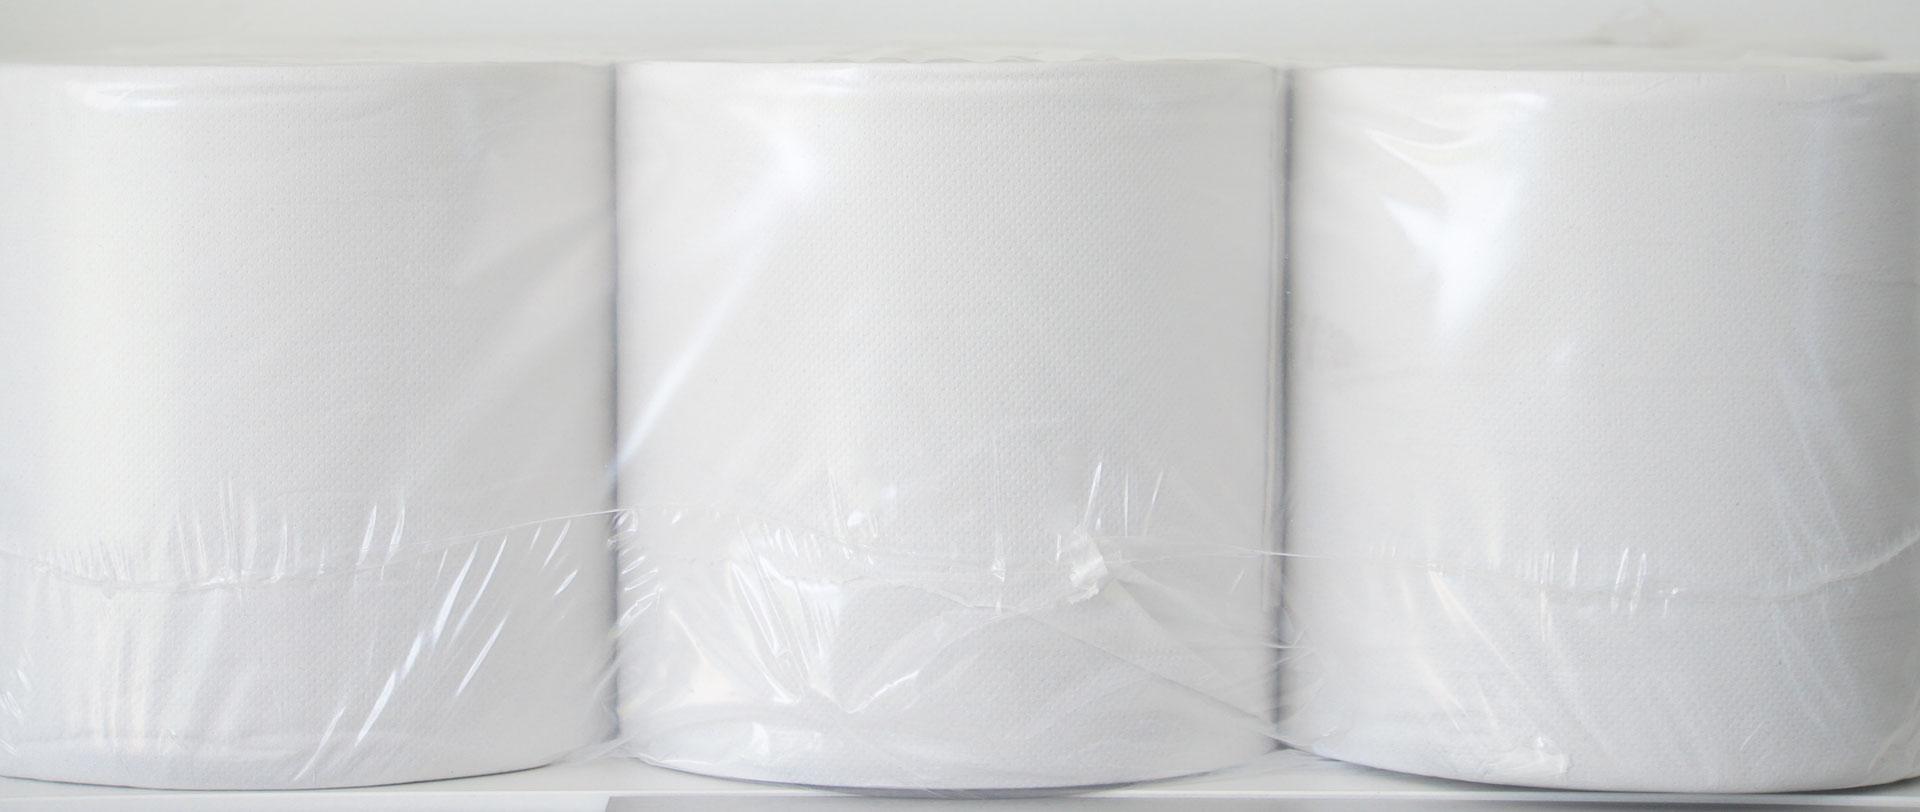 Distributeur de papier toilette Jumbo MIDI Black Edition